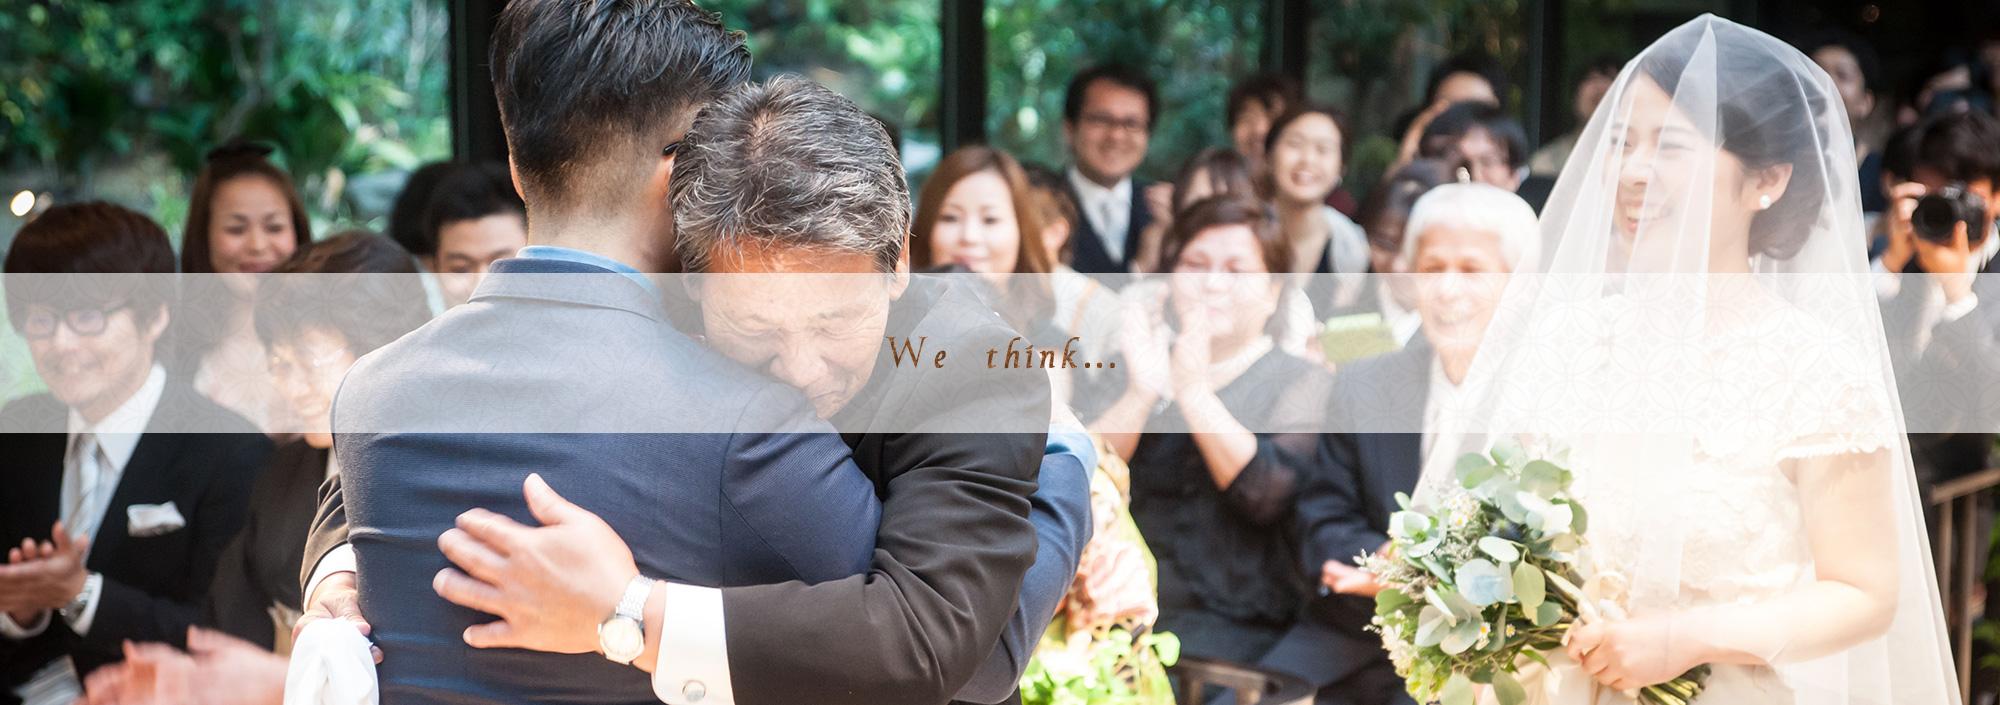 We think…